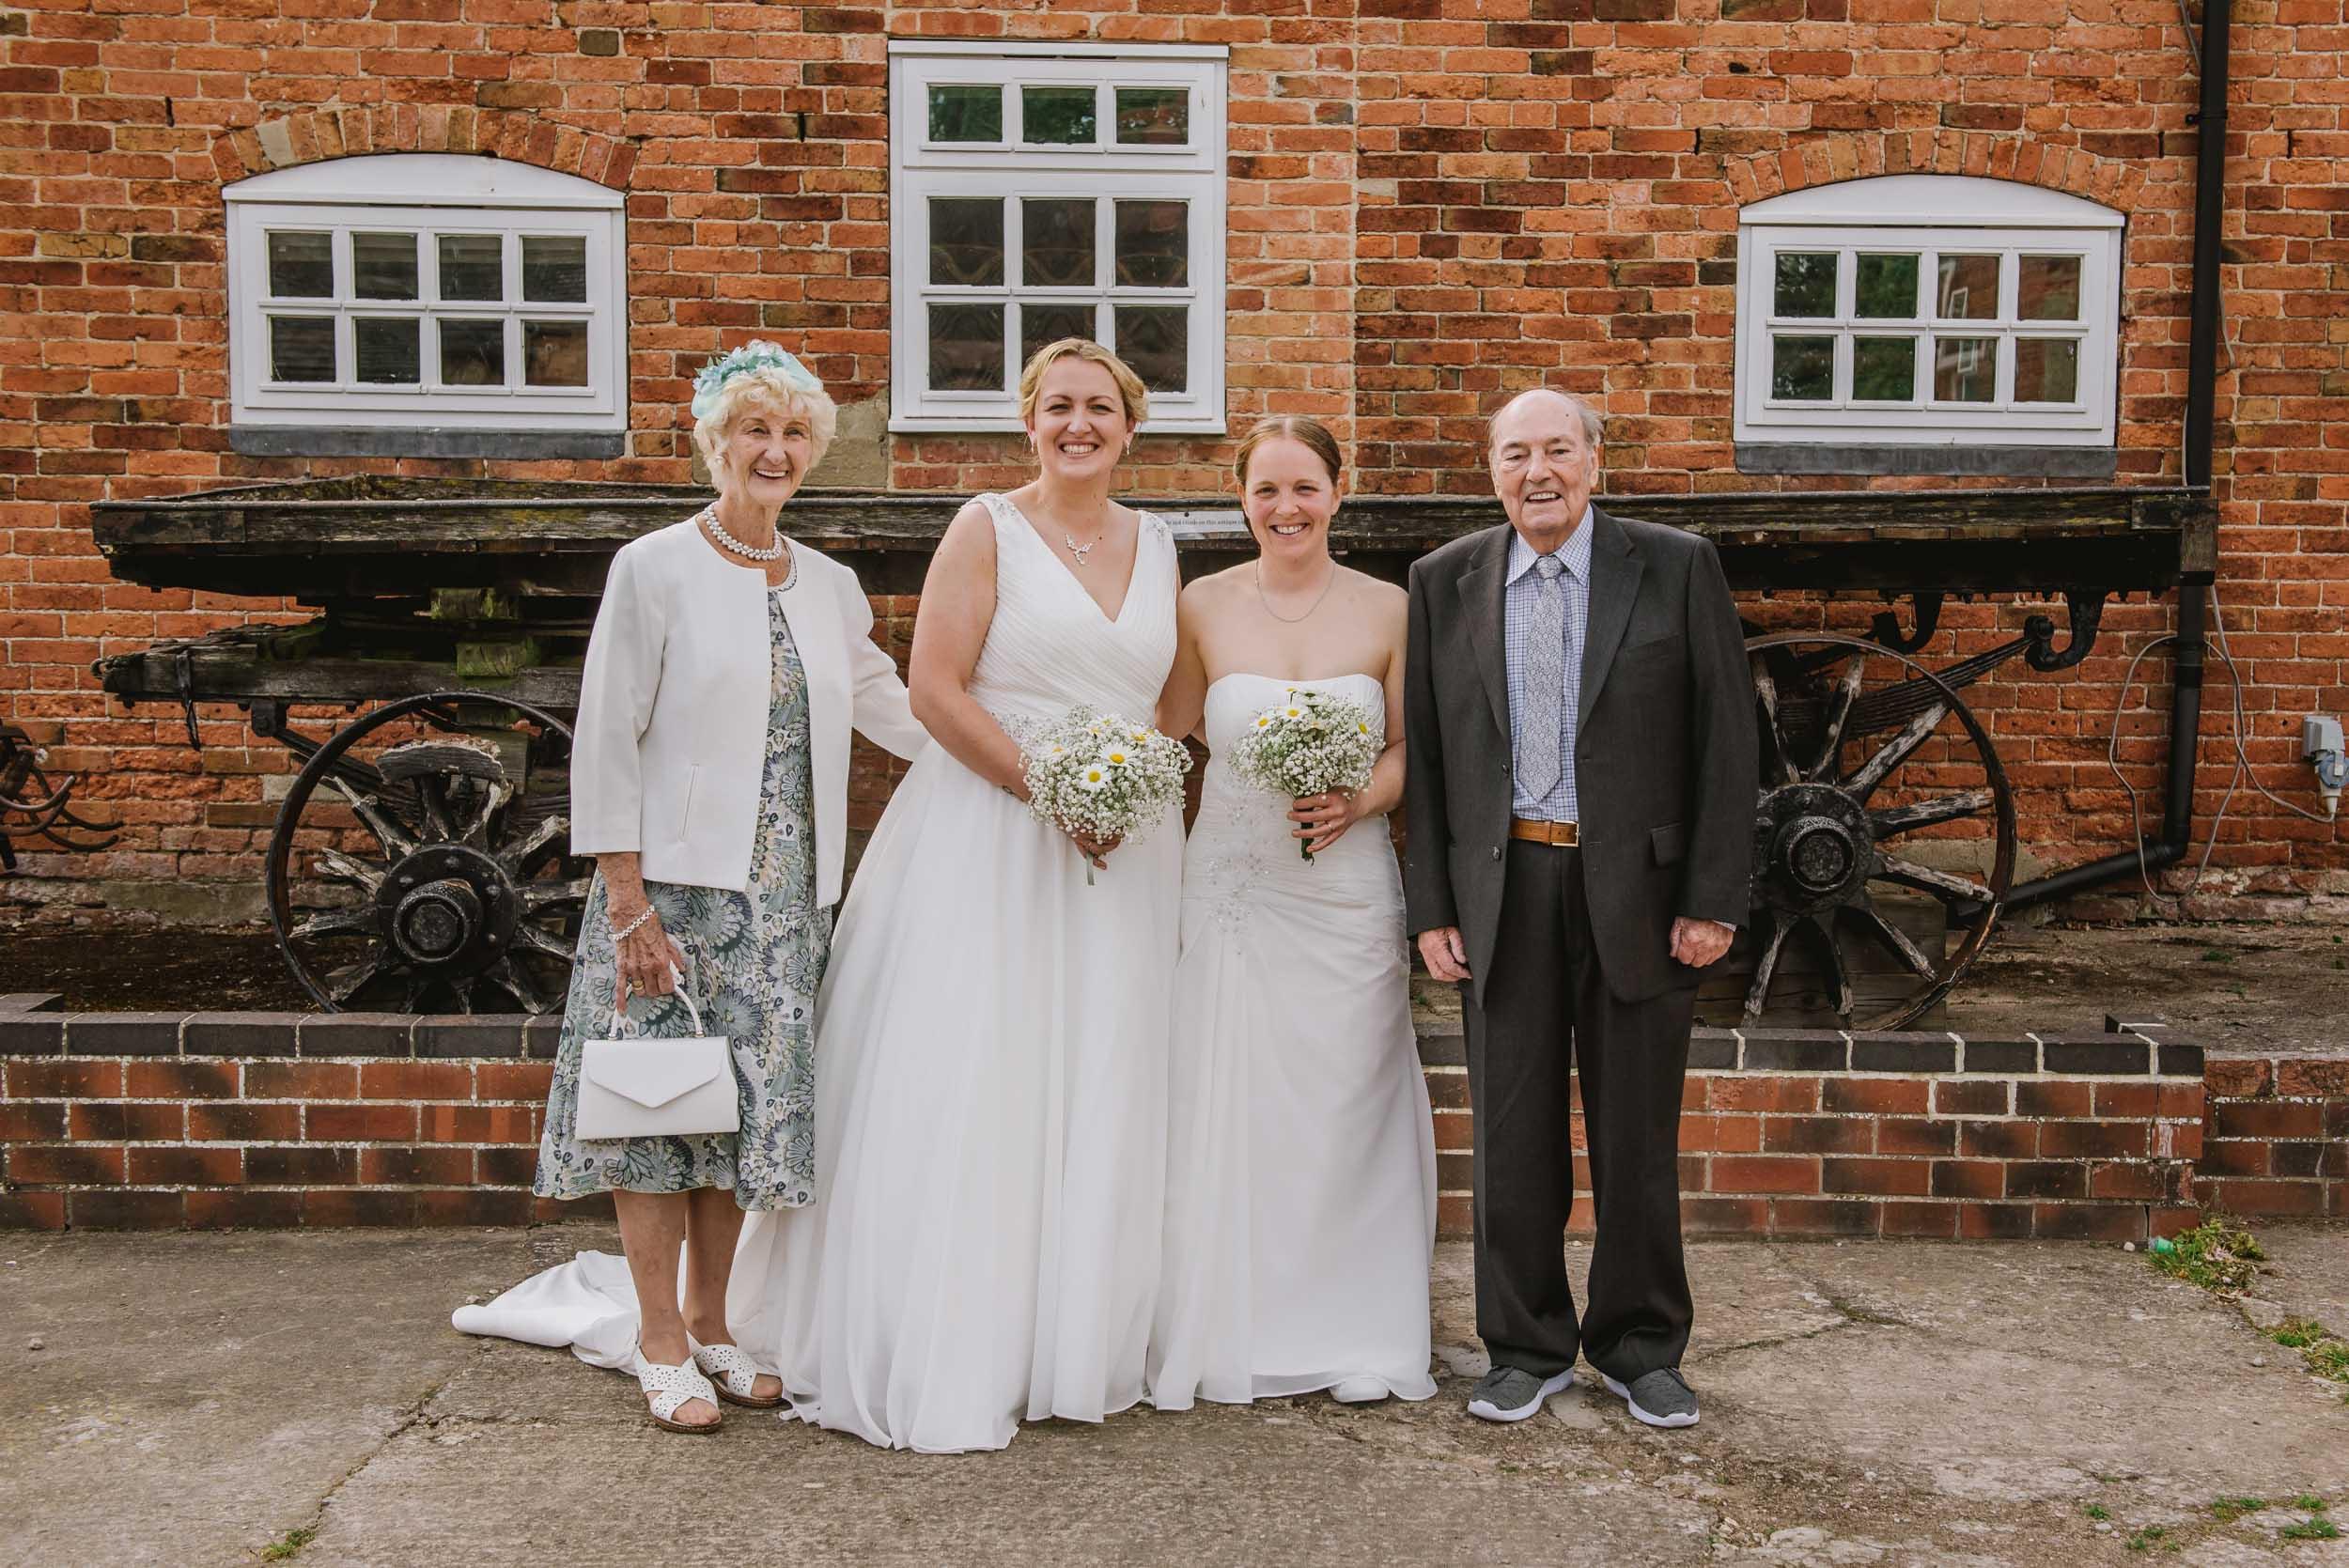 Donington-park-farm-wedding-photography-298.jpg